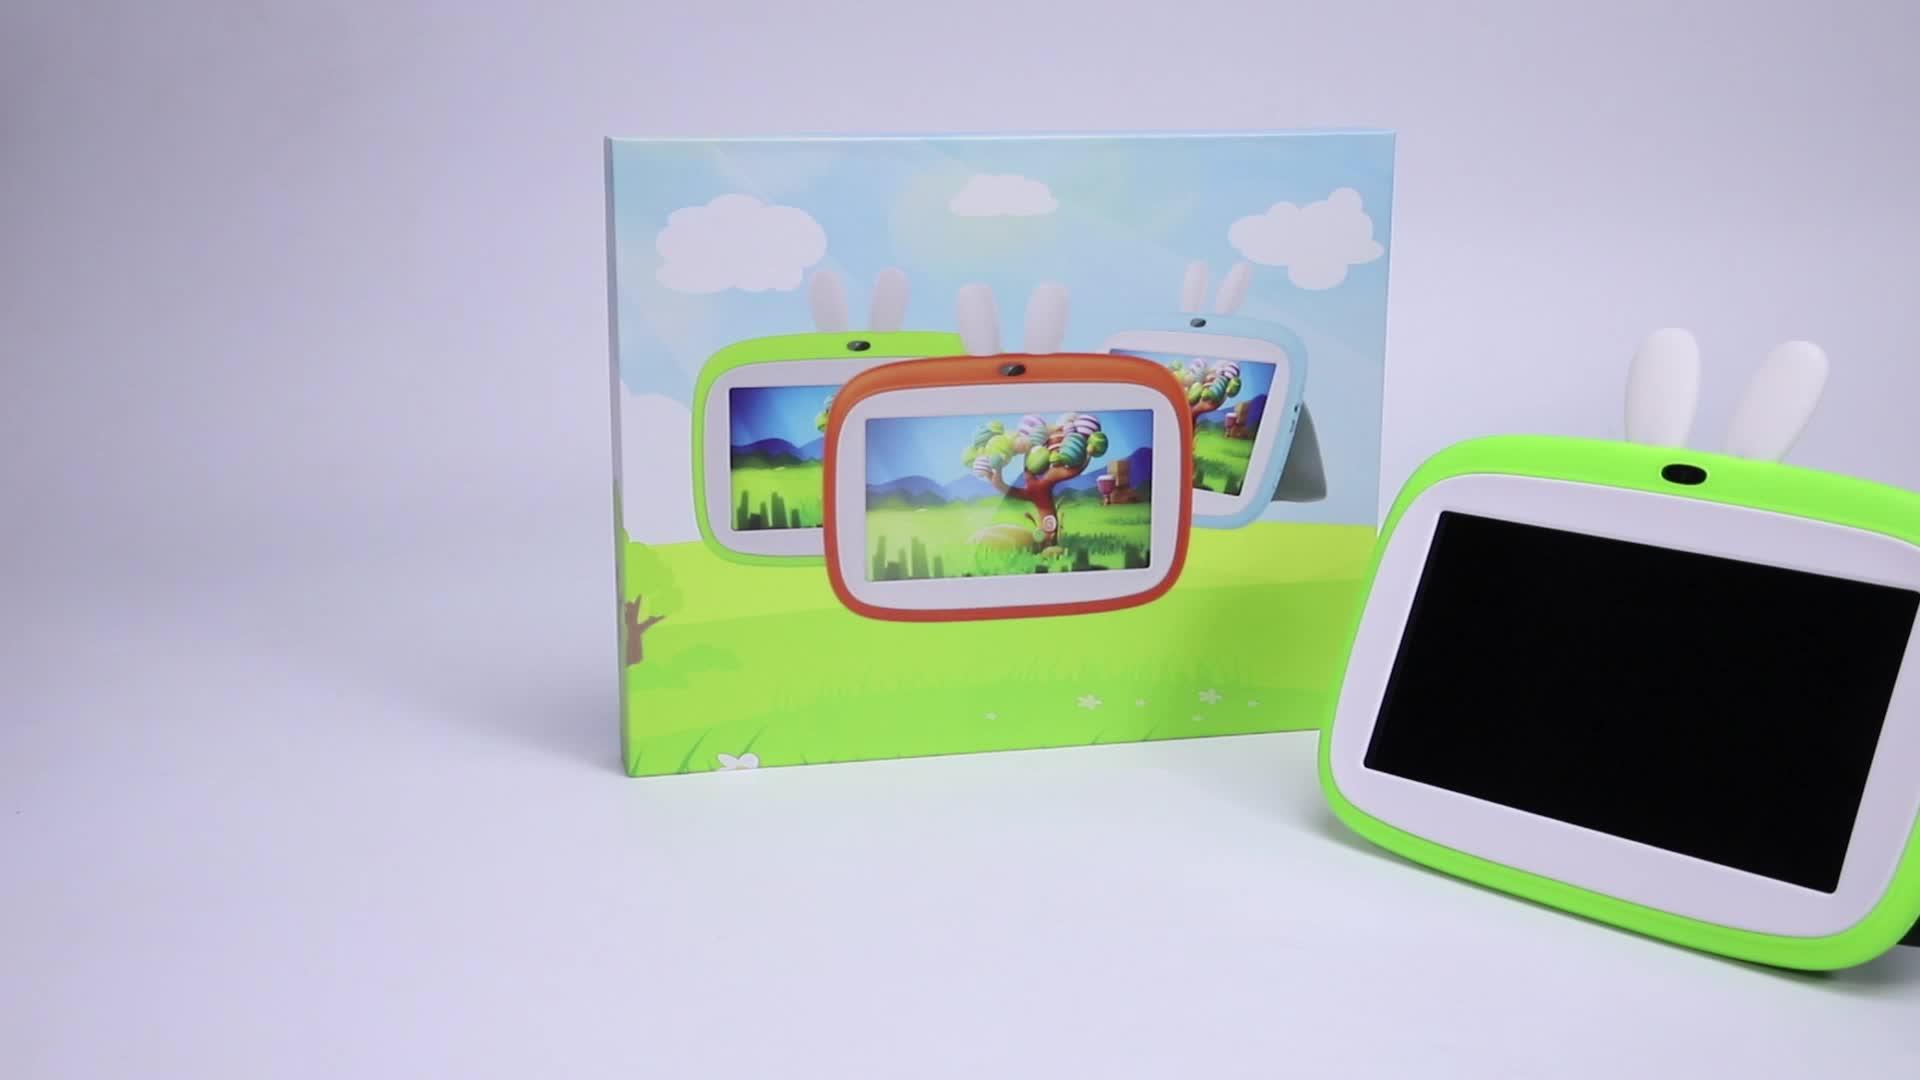 Veidoo RK3126C Tablet 7 Inch Private Model Learning Phablet Best Selling Smart Kids Tablet Pc